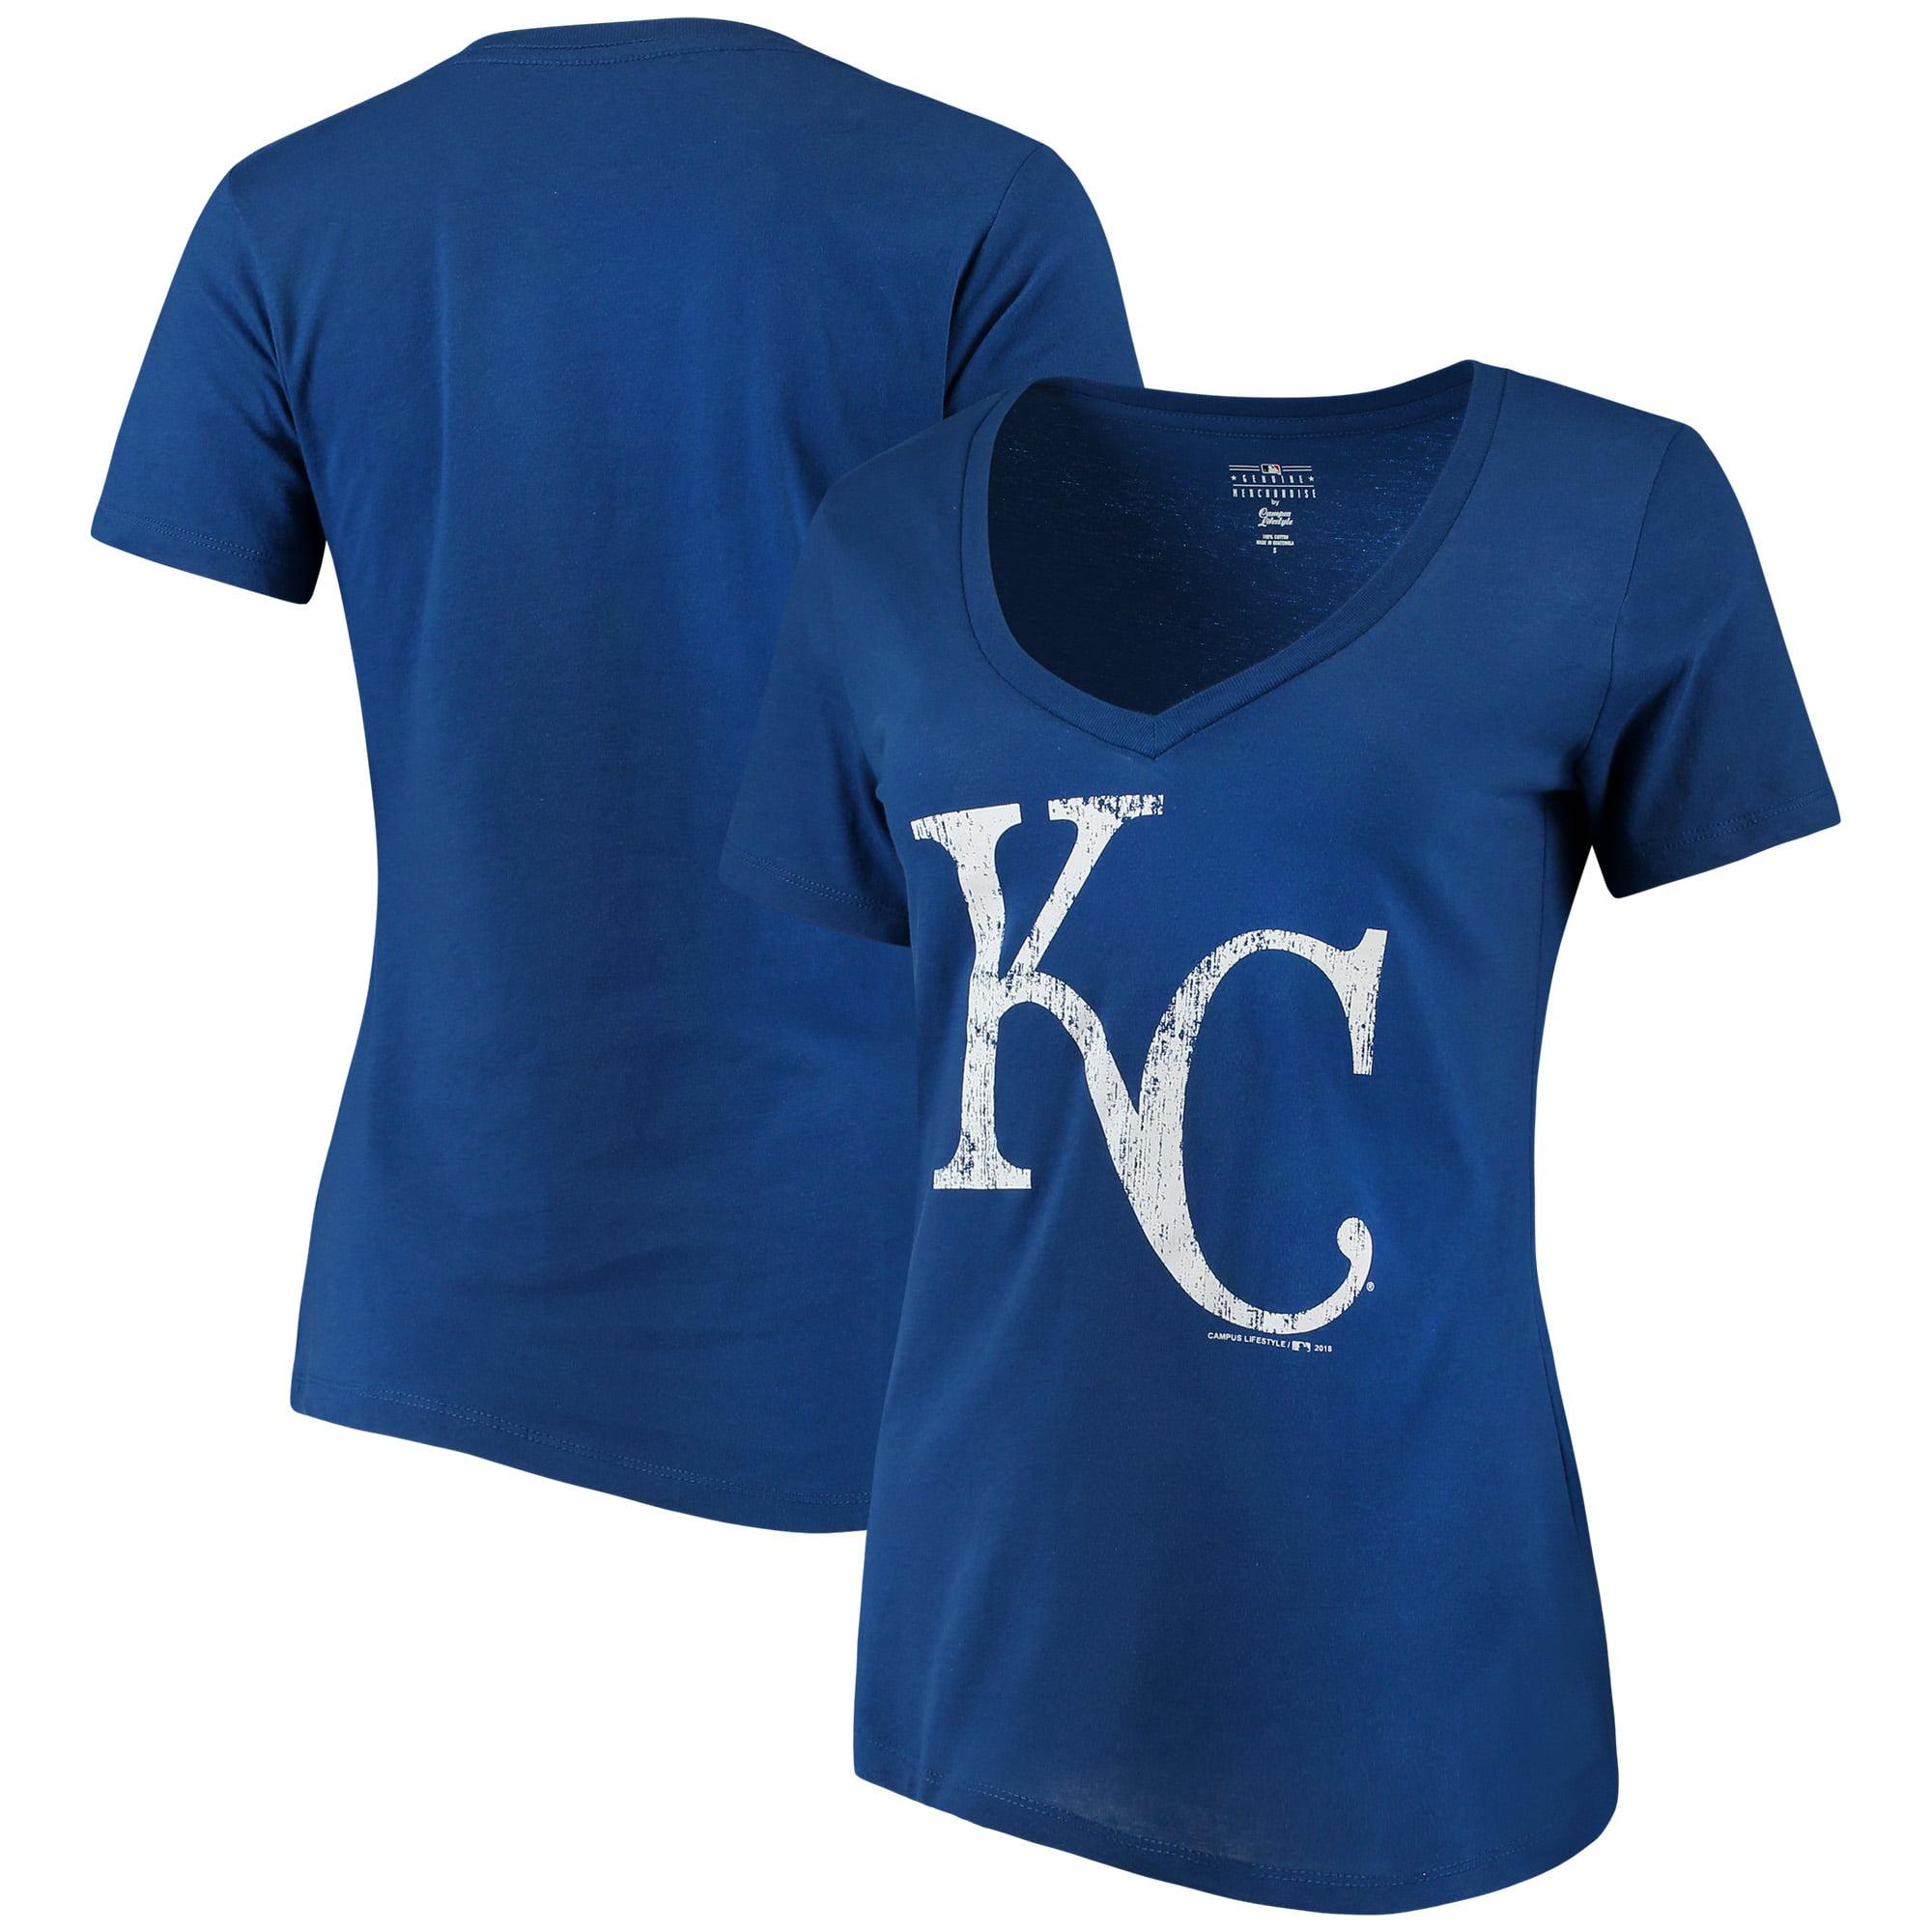 Kansas City Royals New Era Women's V-Neck T-Shirt - Royal